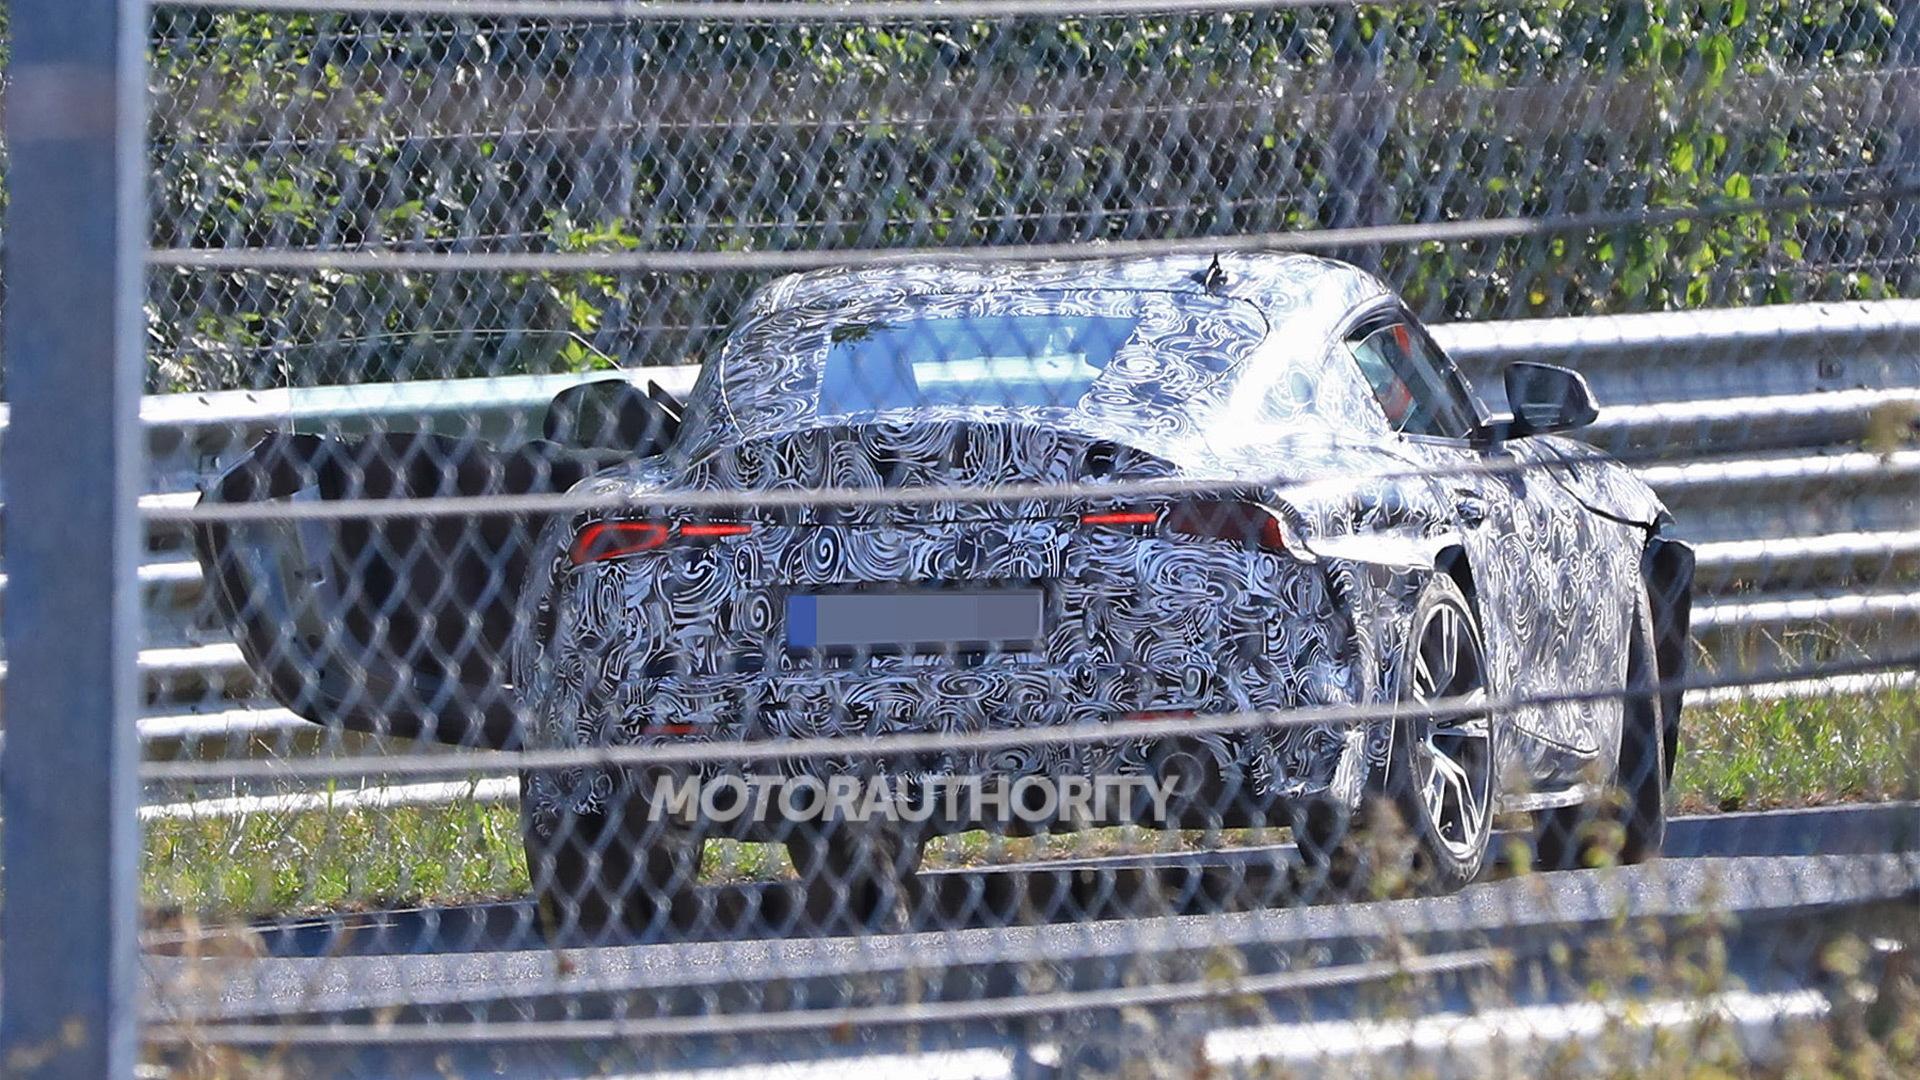 2020 Toyota Supra spy shots - Image via S. Baldauf/SB-Medien